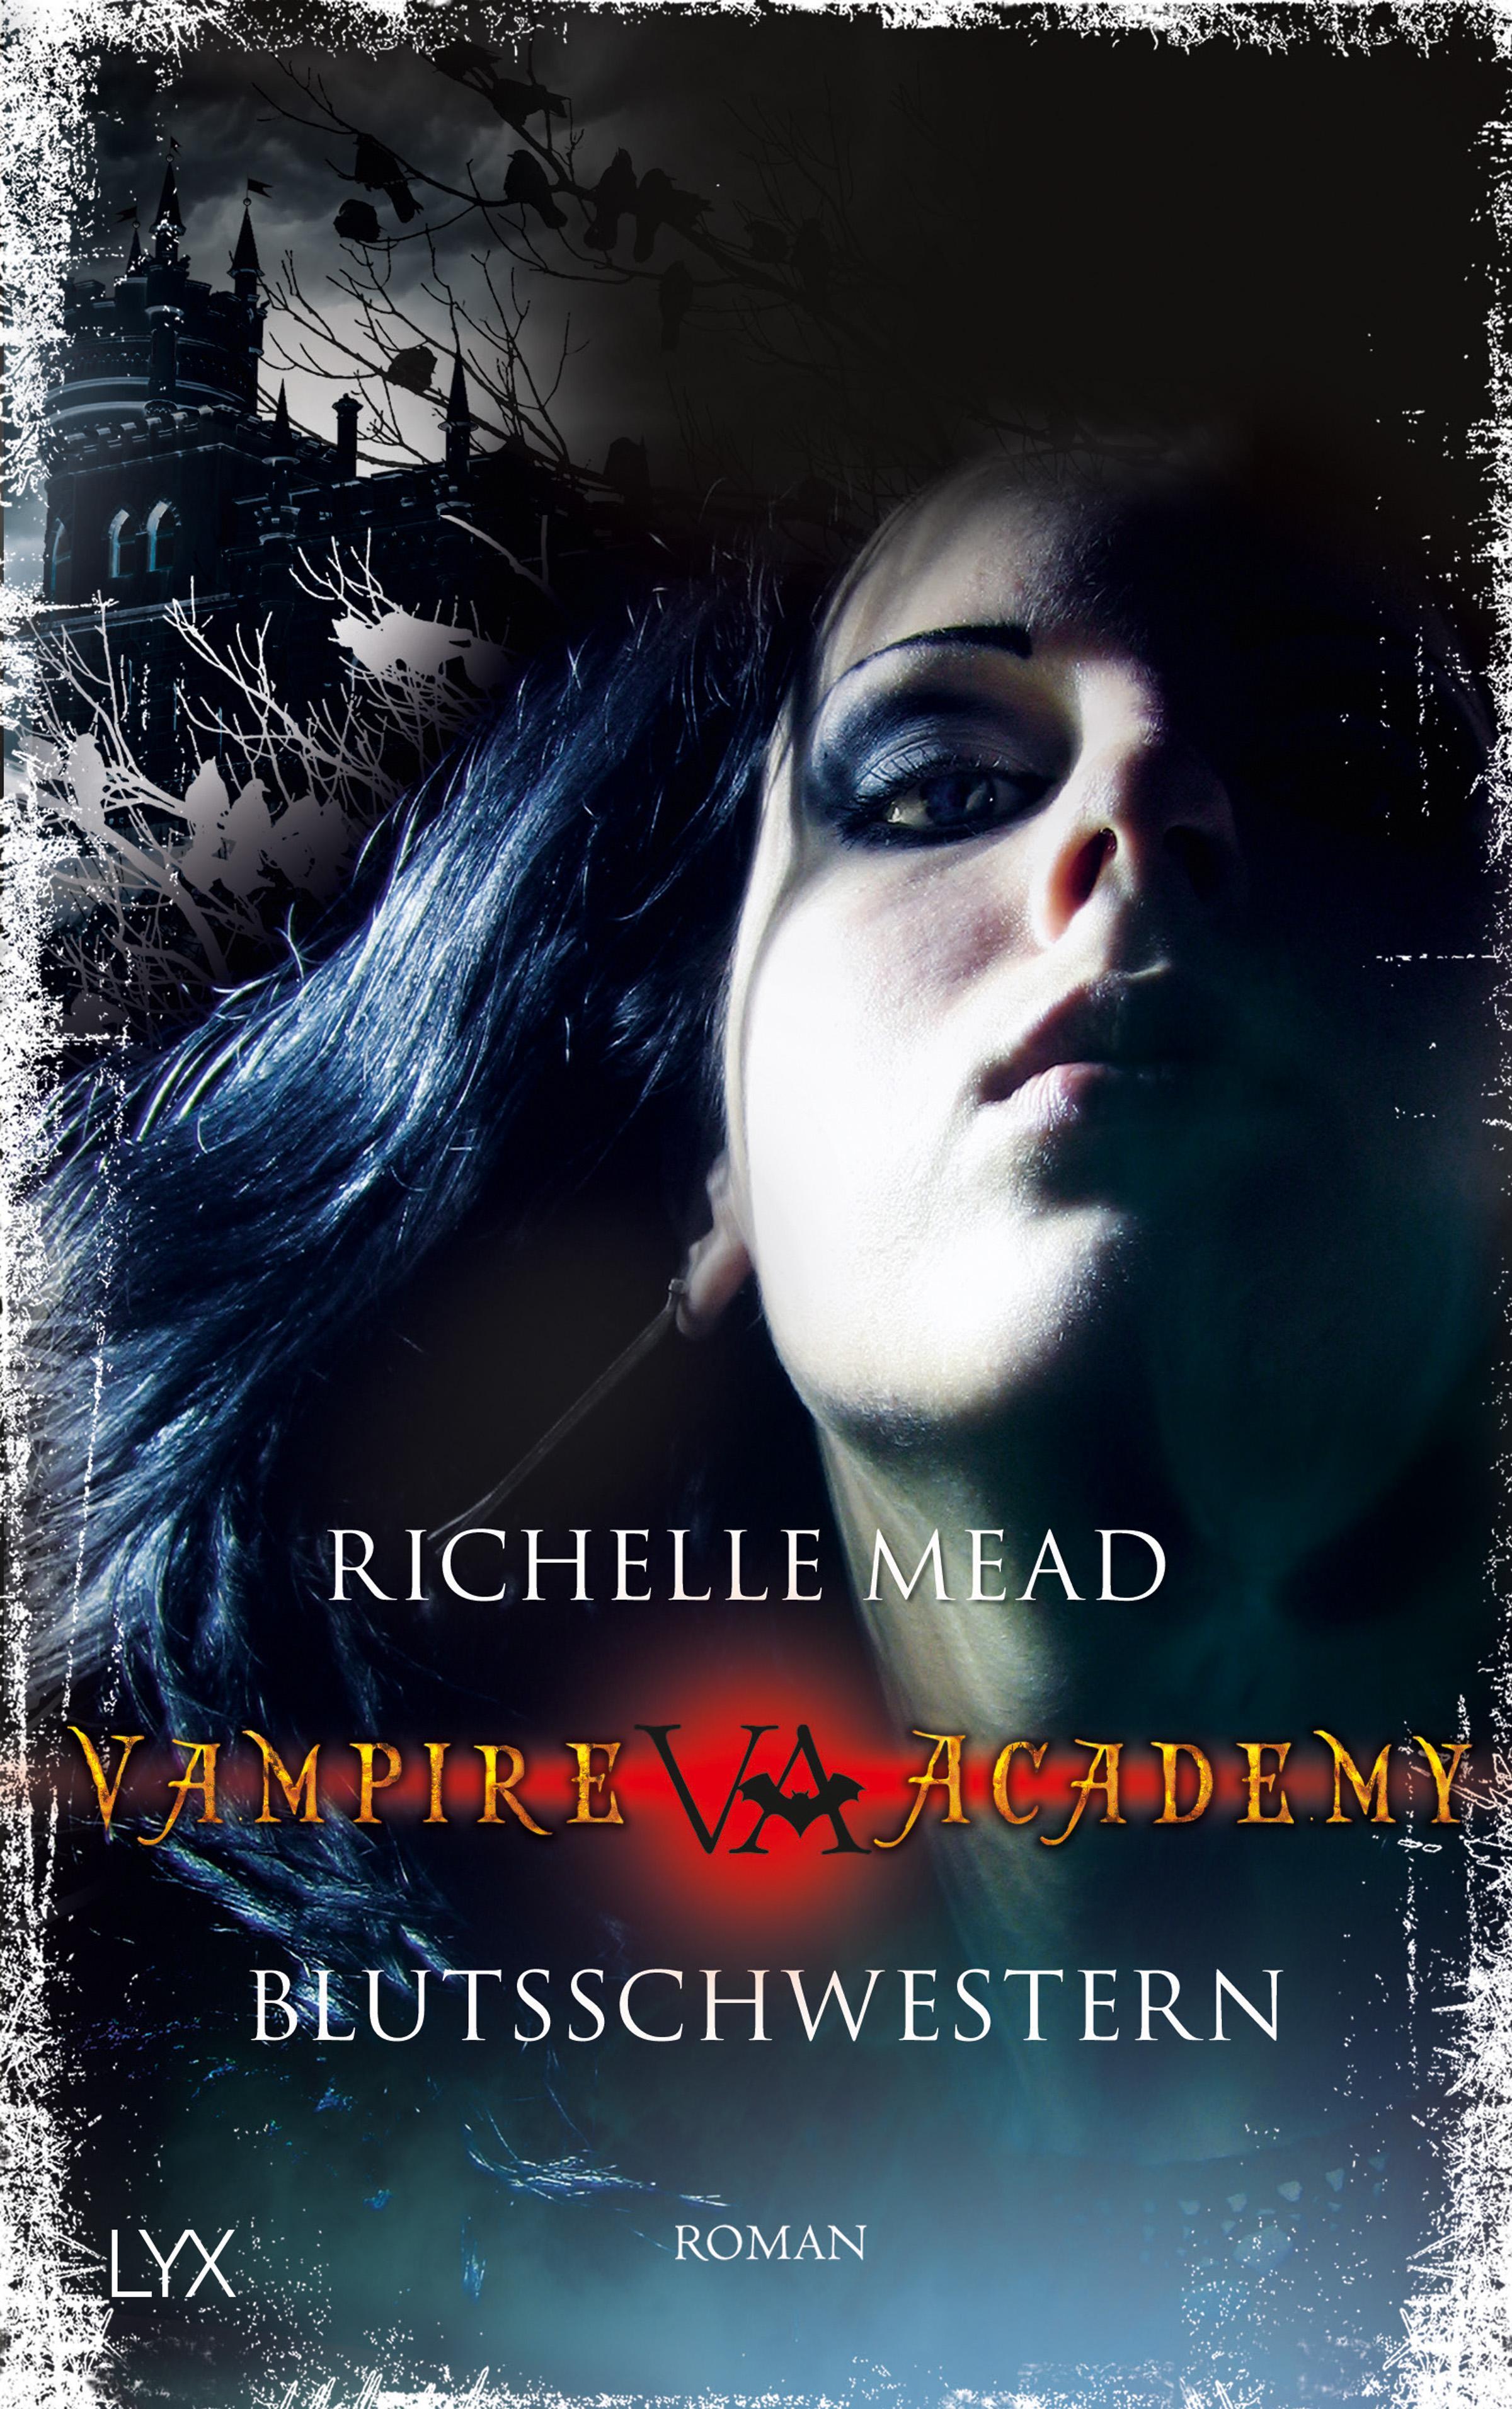 Vampire-Academy-01-Richelle-Mead